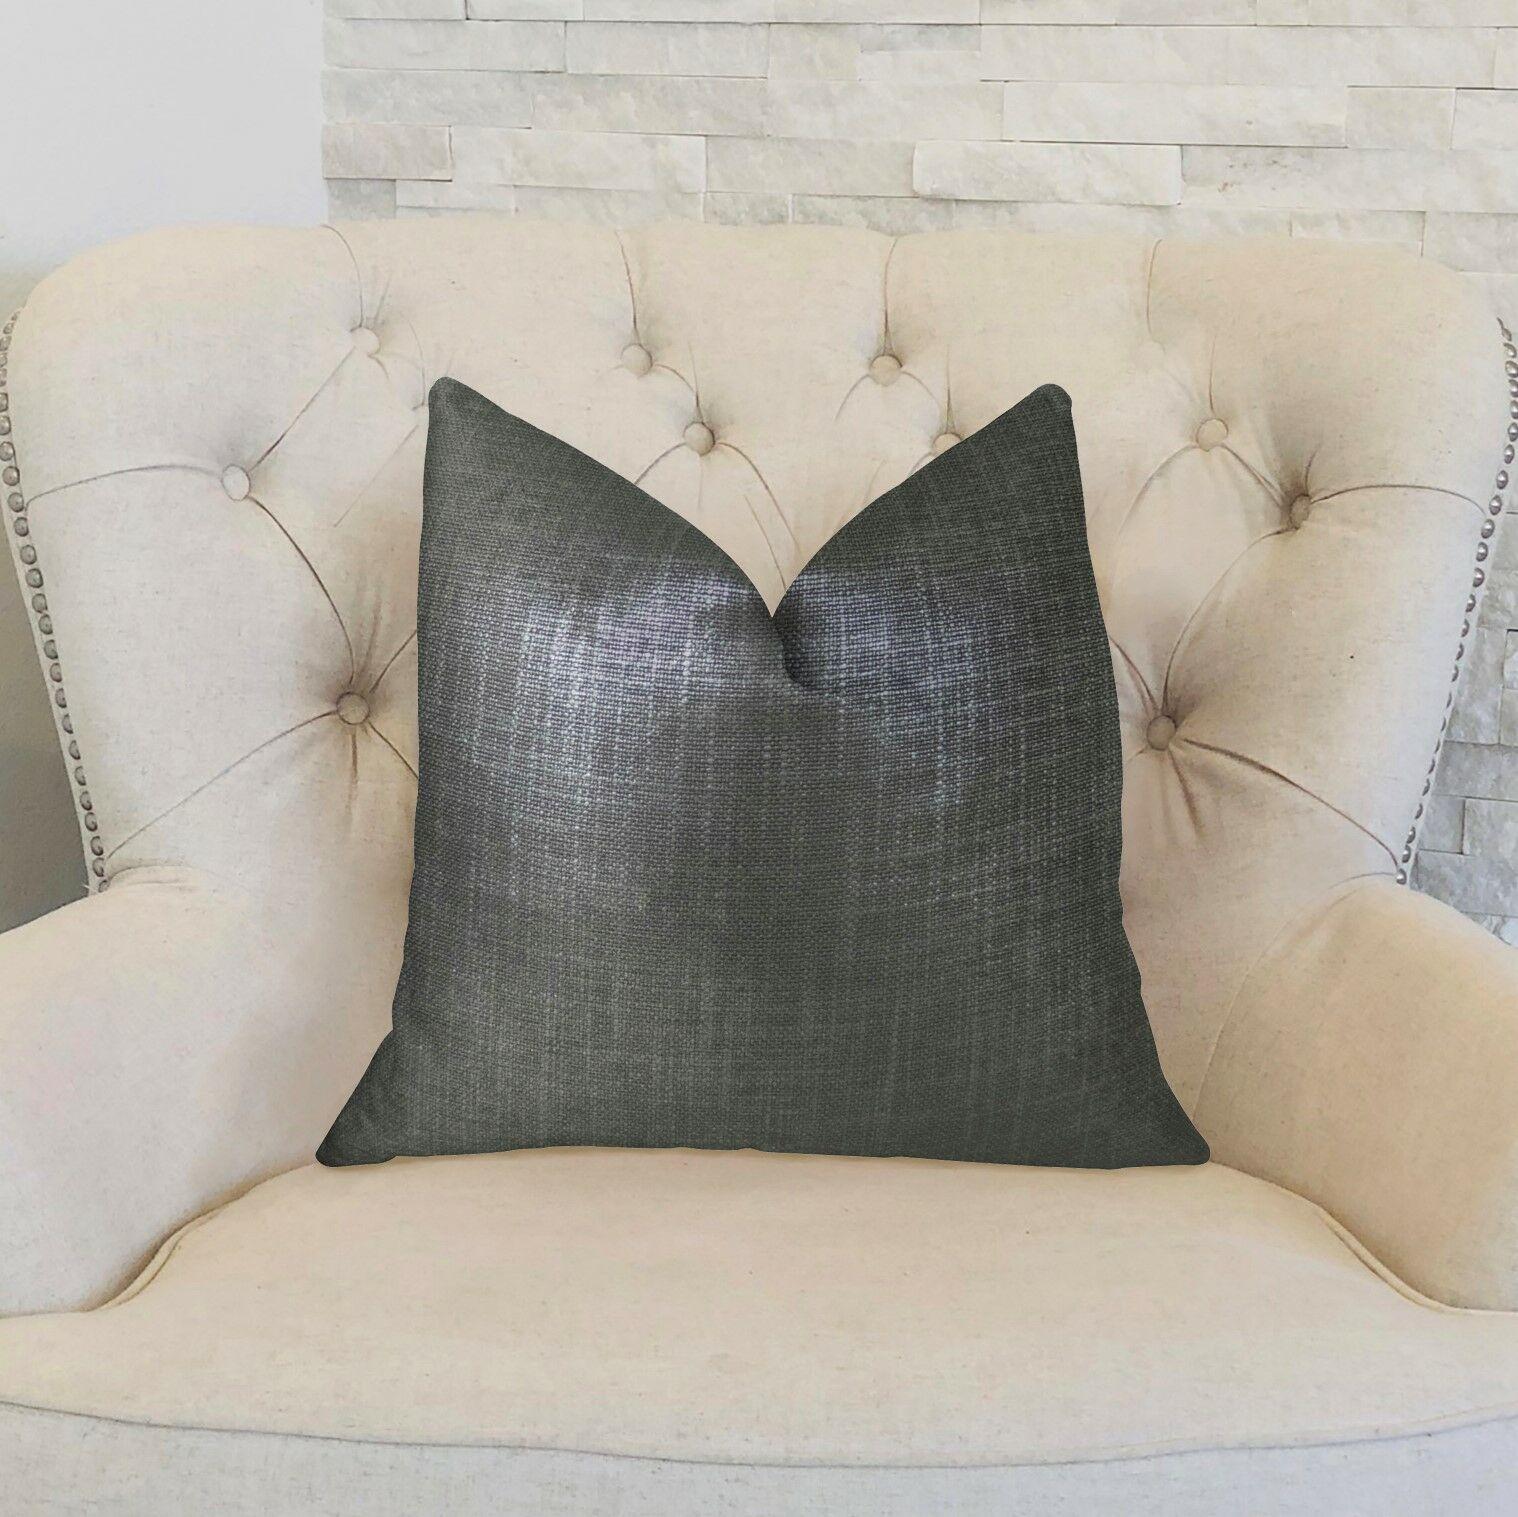 Gantz Handmade Luxury Pillow Size: 16